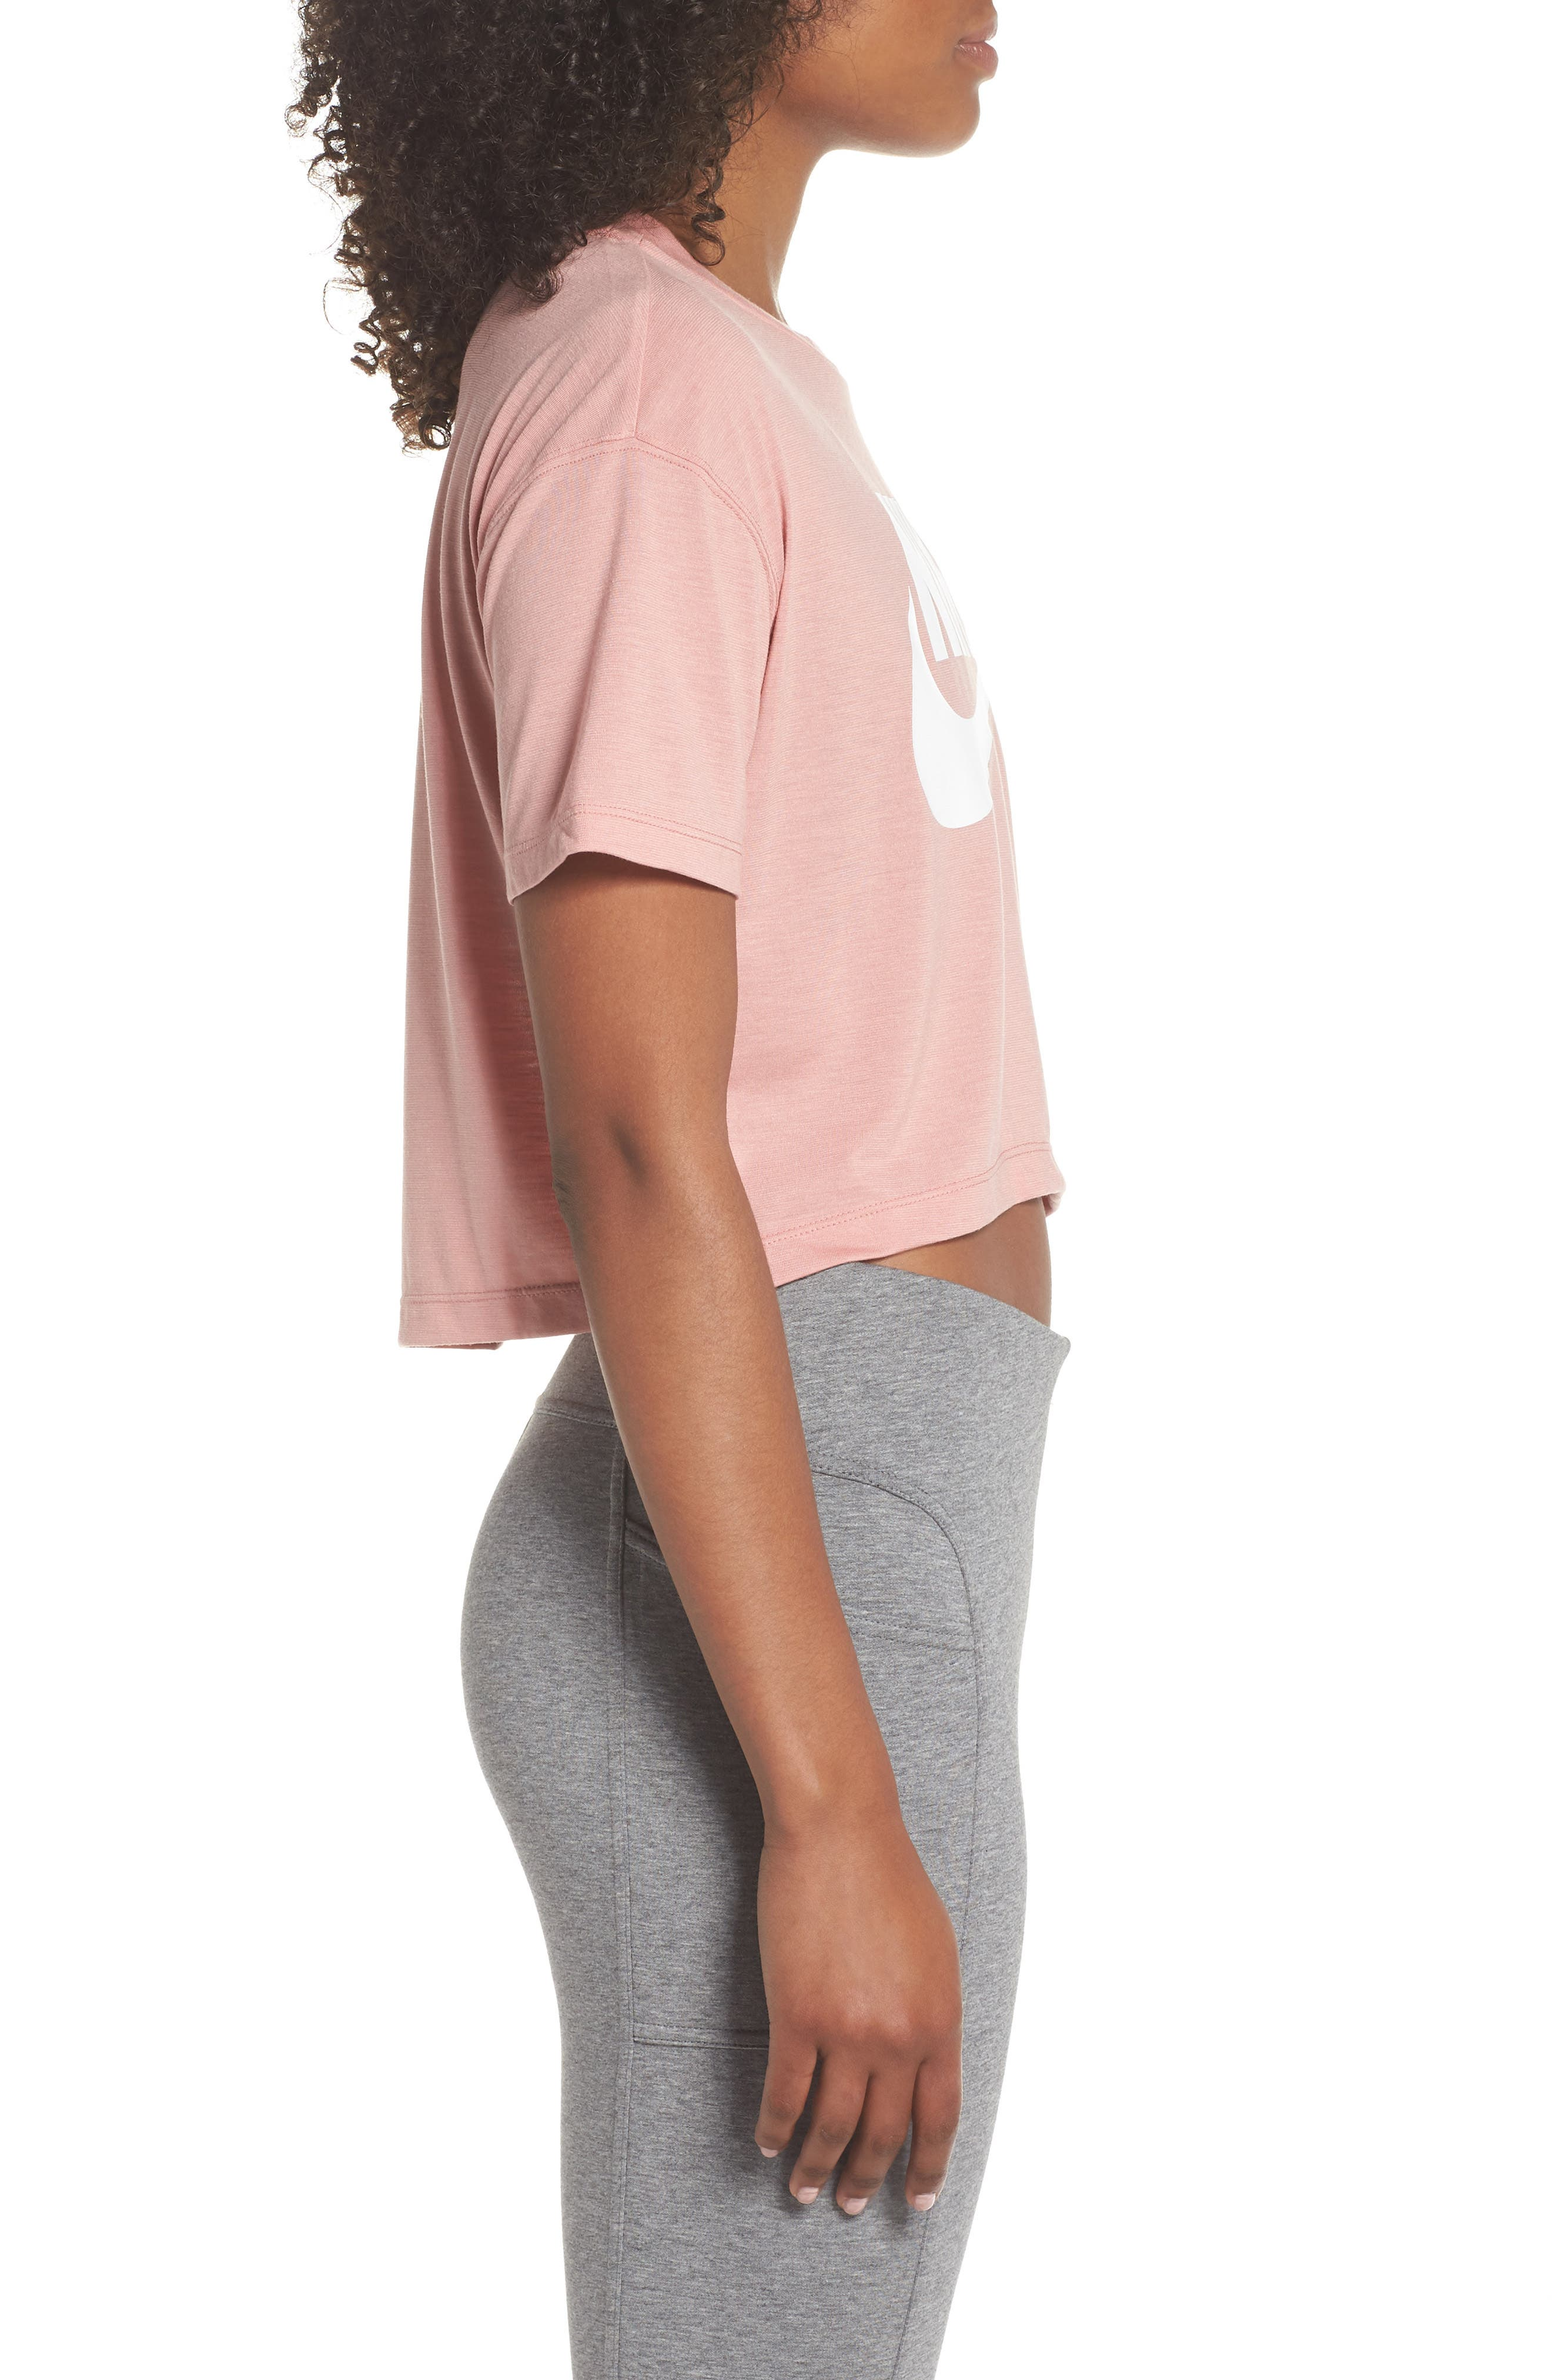 Sportswear Crop Top,                             Alternate thumbnail 3, color,                             Rust Pink/ White